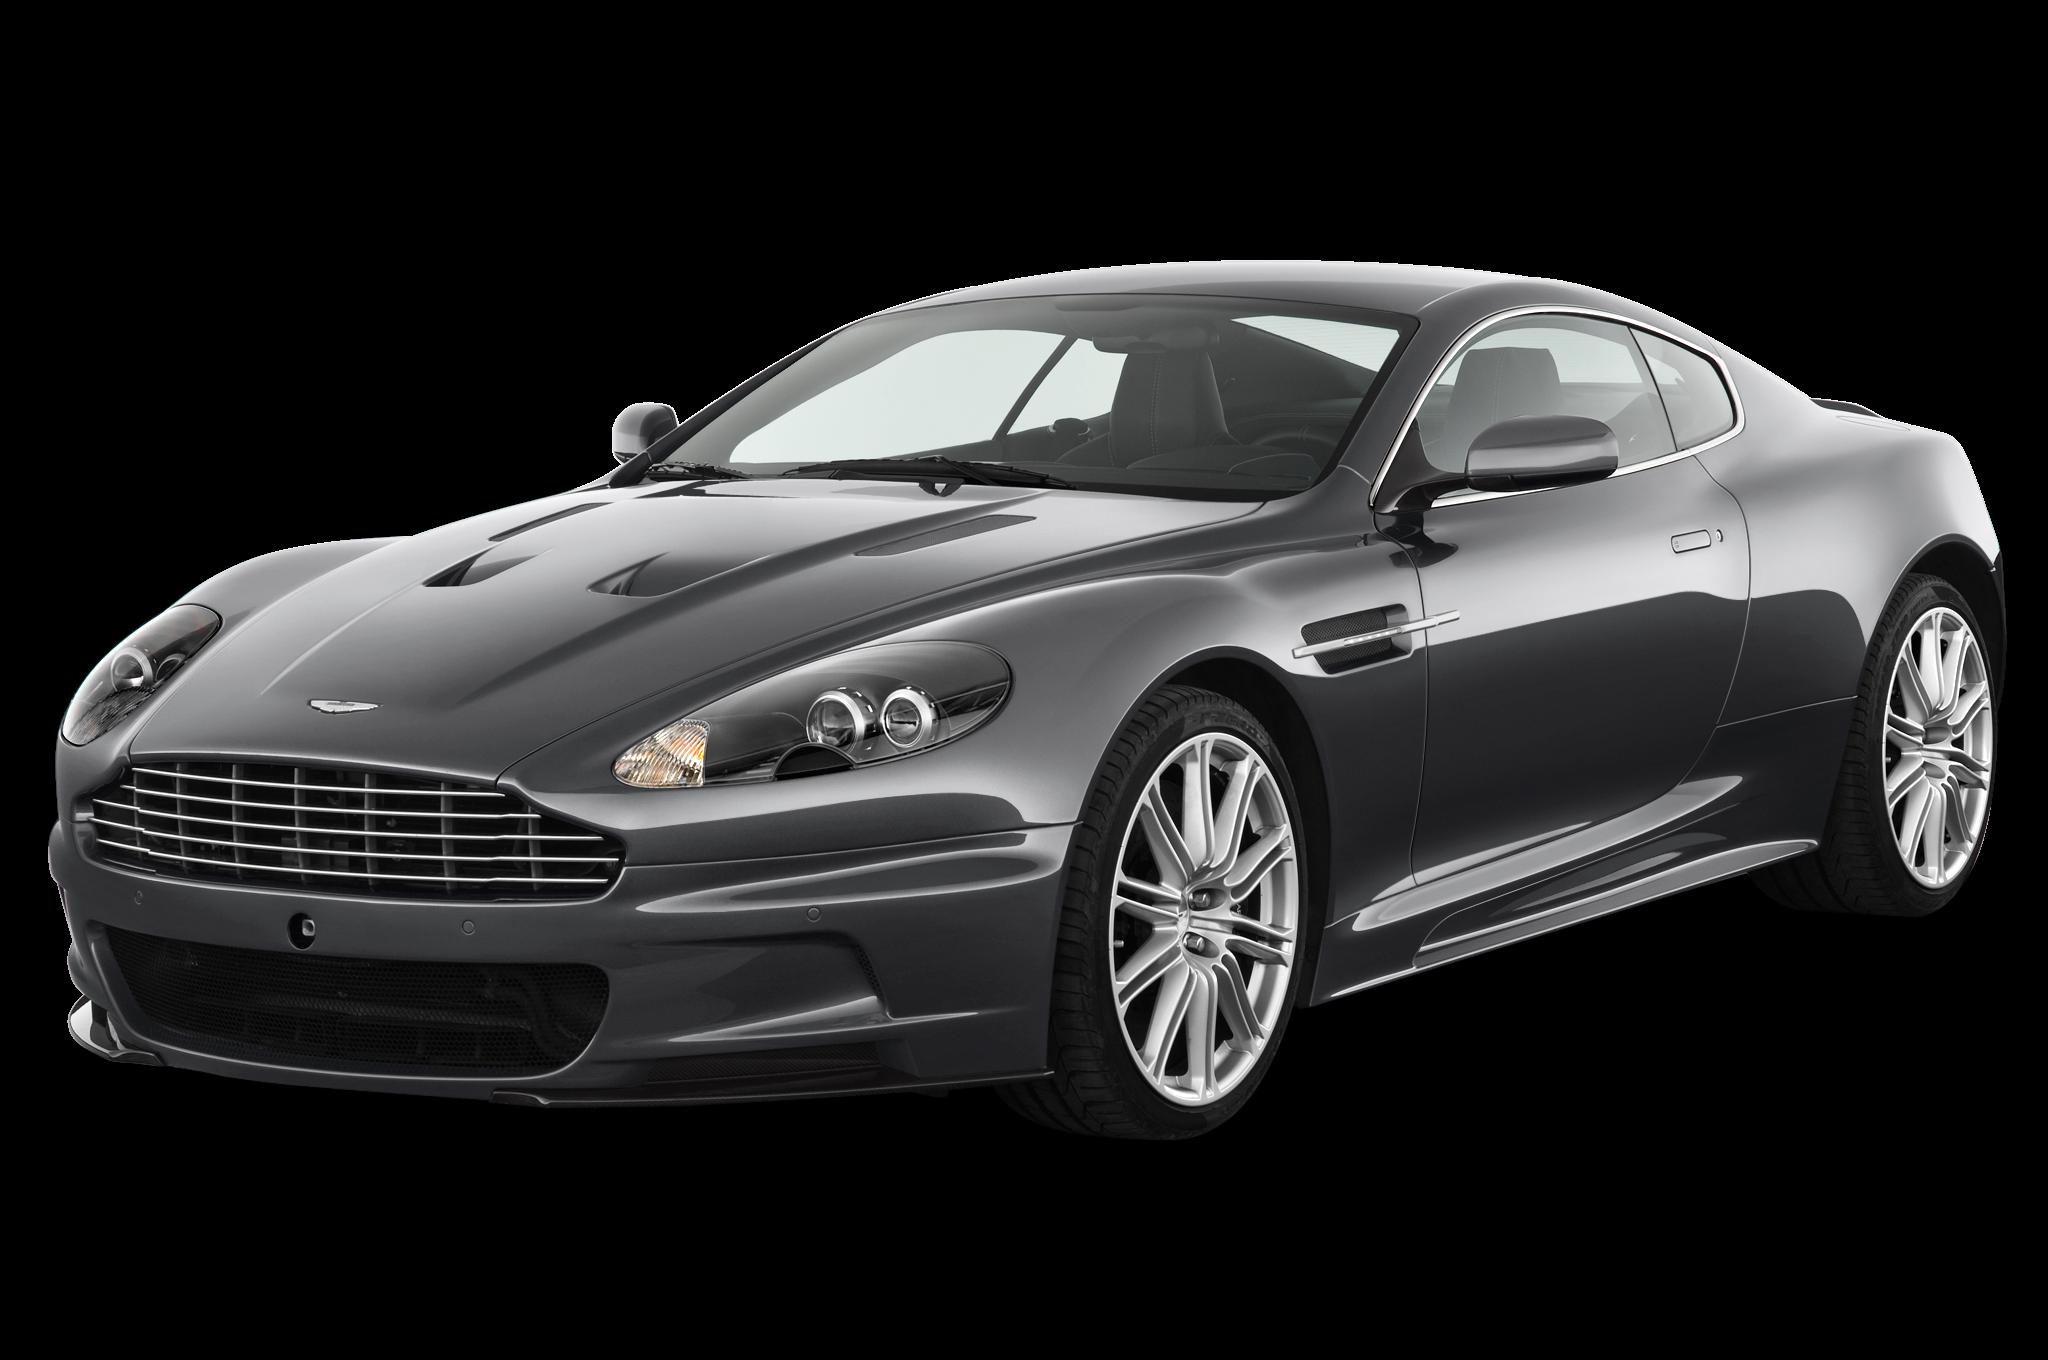 Aston Martin Cars - International Car Price & Overview